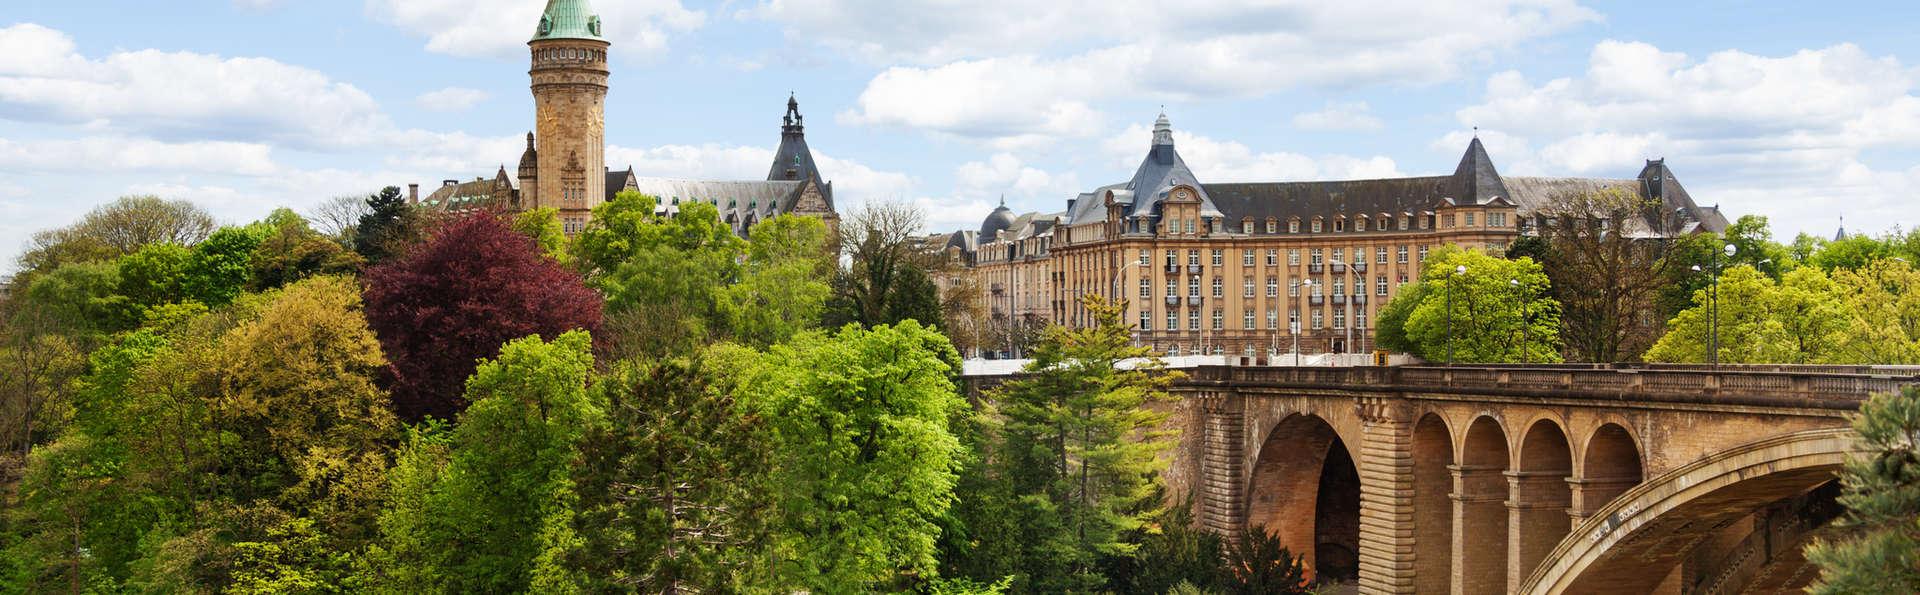 Grand Hotel Cravat - Luxembourg.jpg